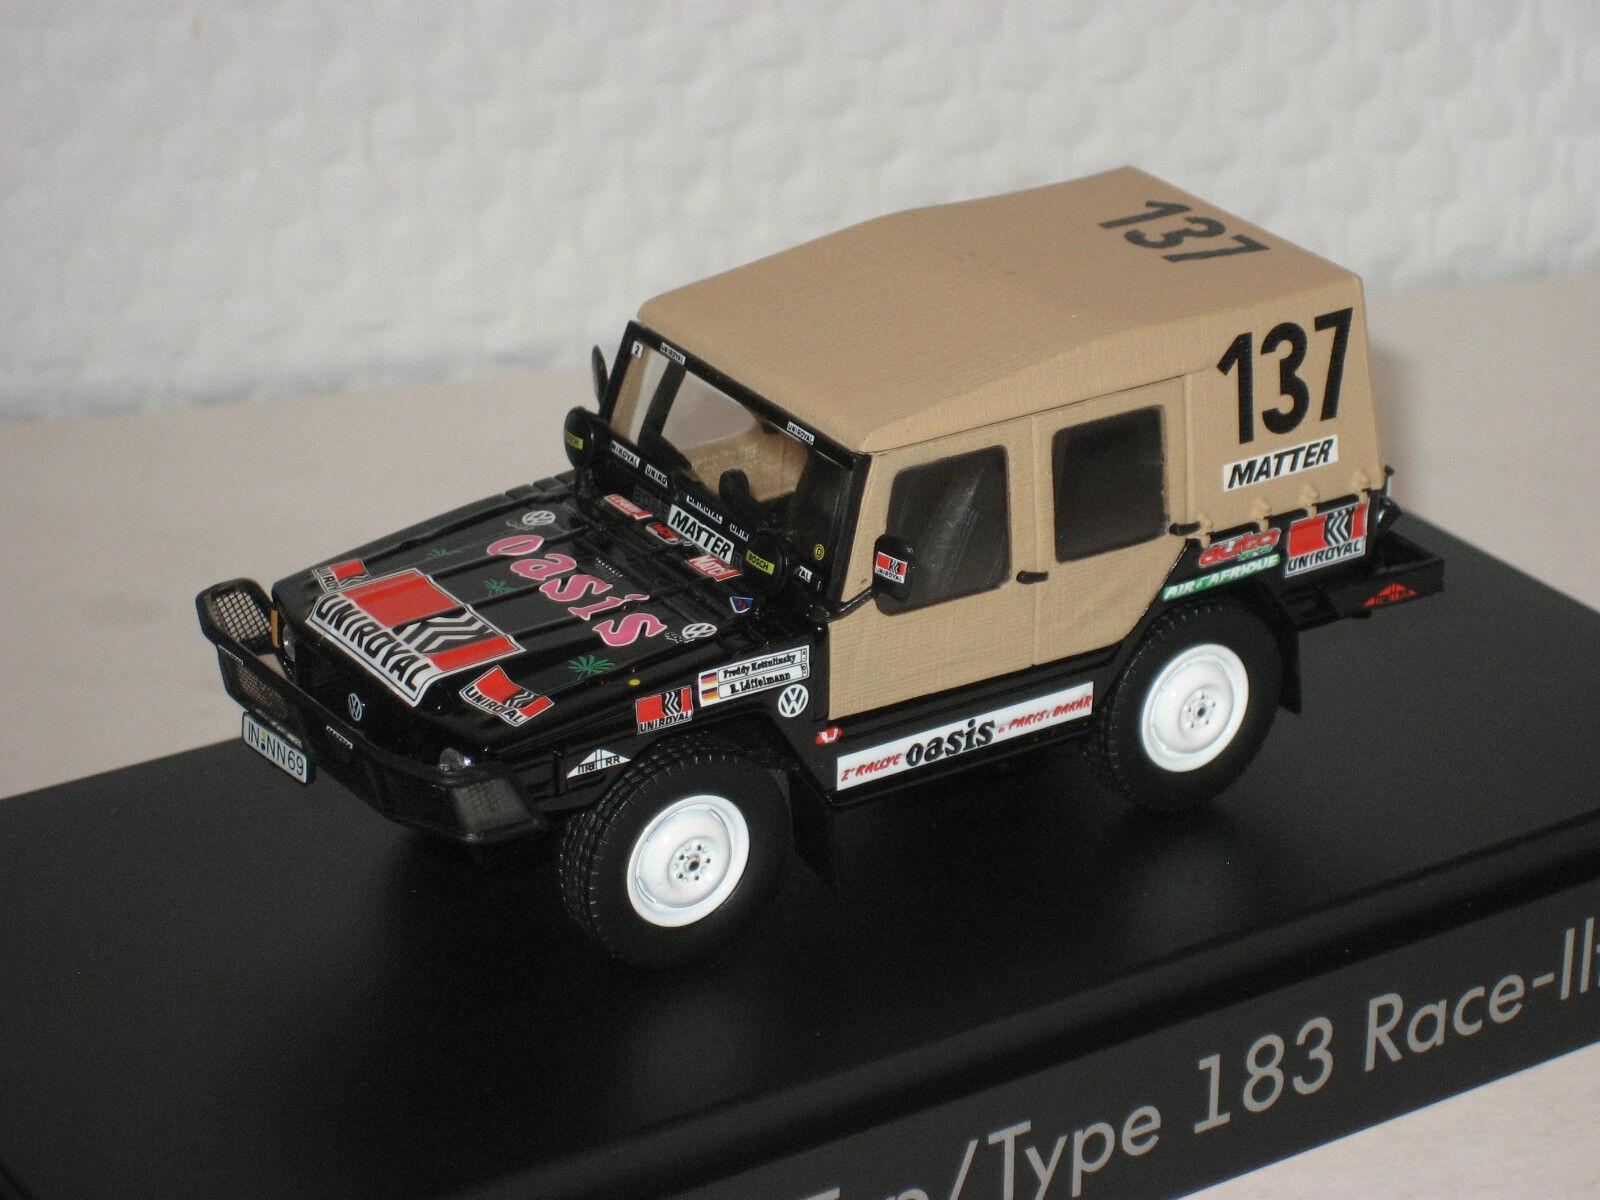 VW Iltis Type 183 Race Race Race black neu &  OVP 183.099.300.K1W 359be5